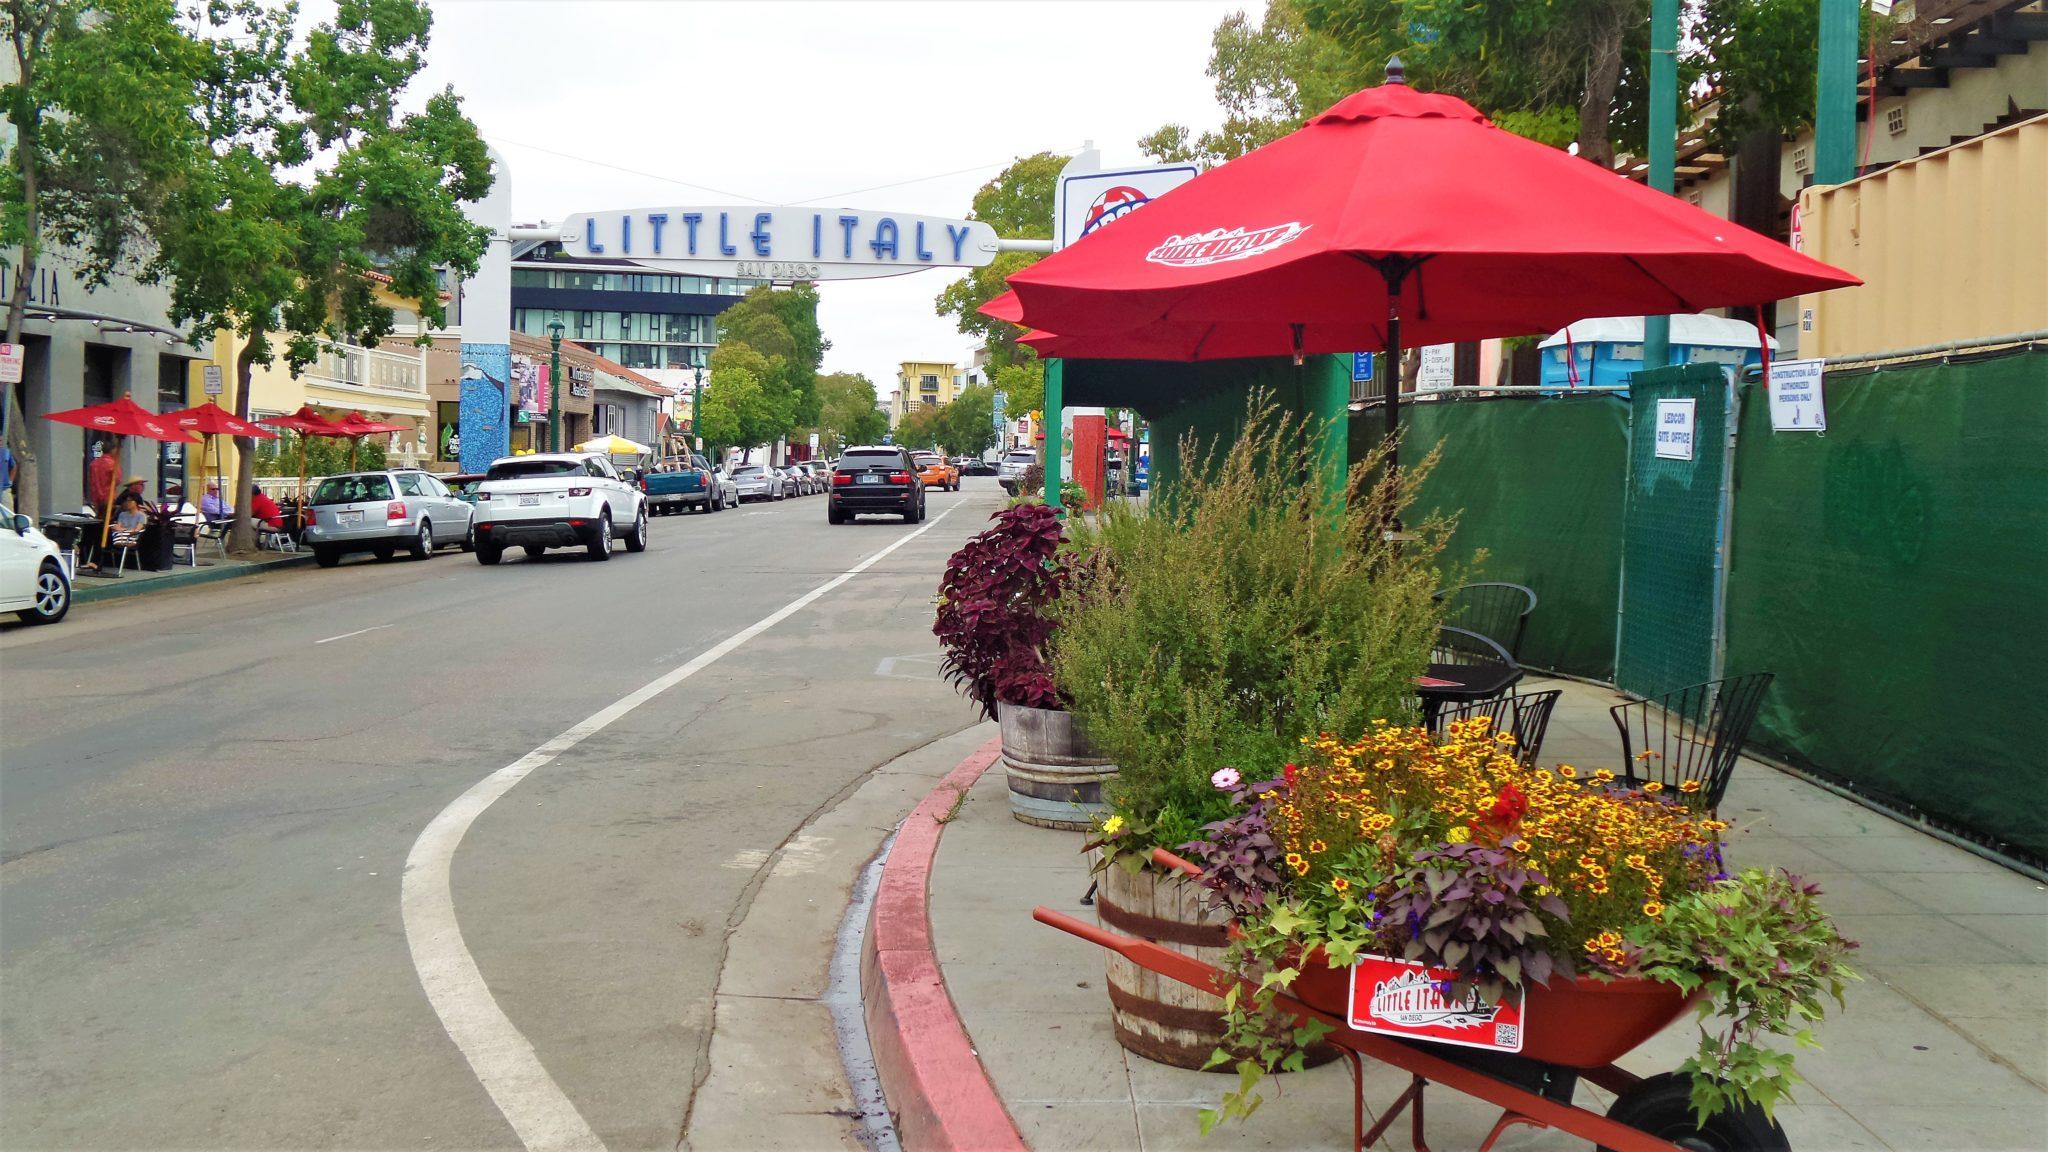 Little Italy area, San Diego, California